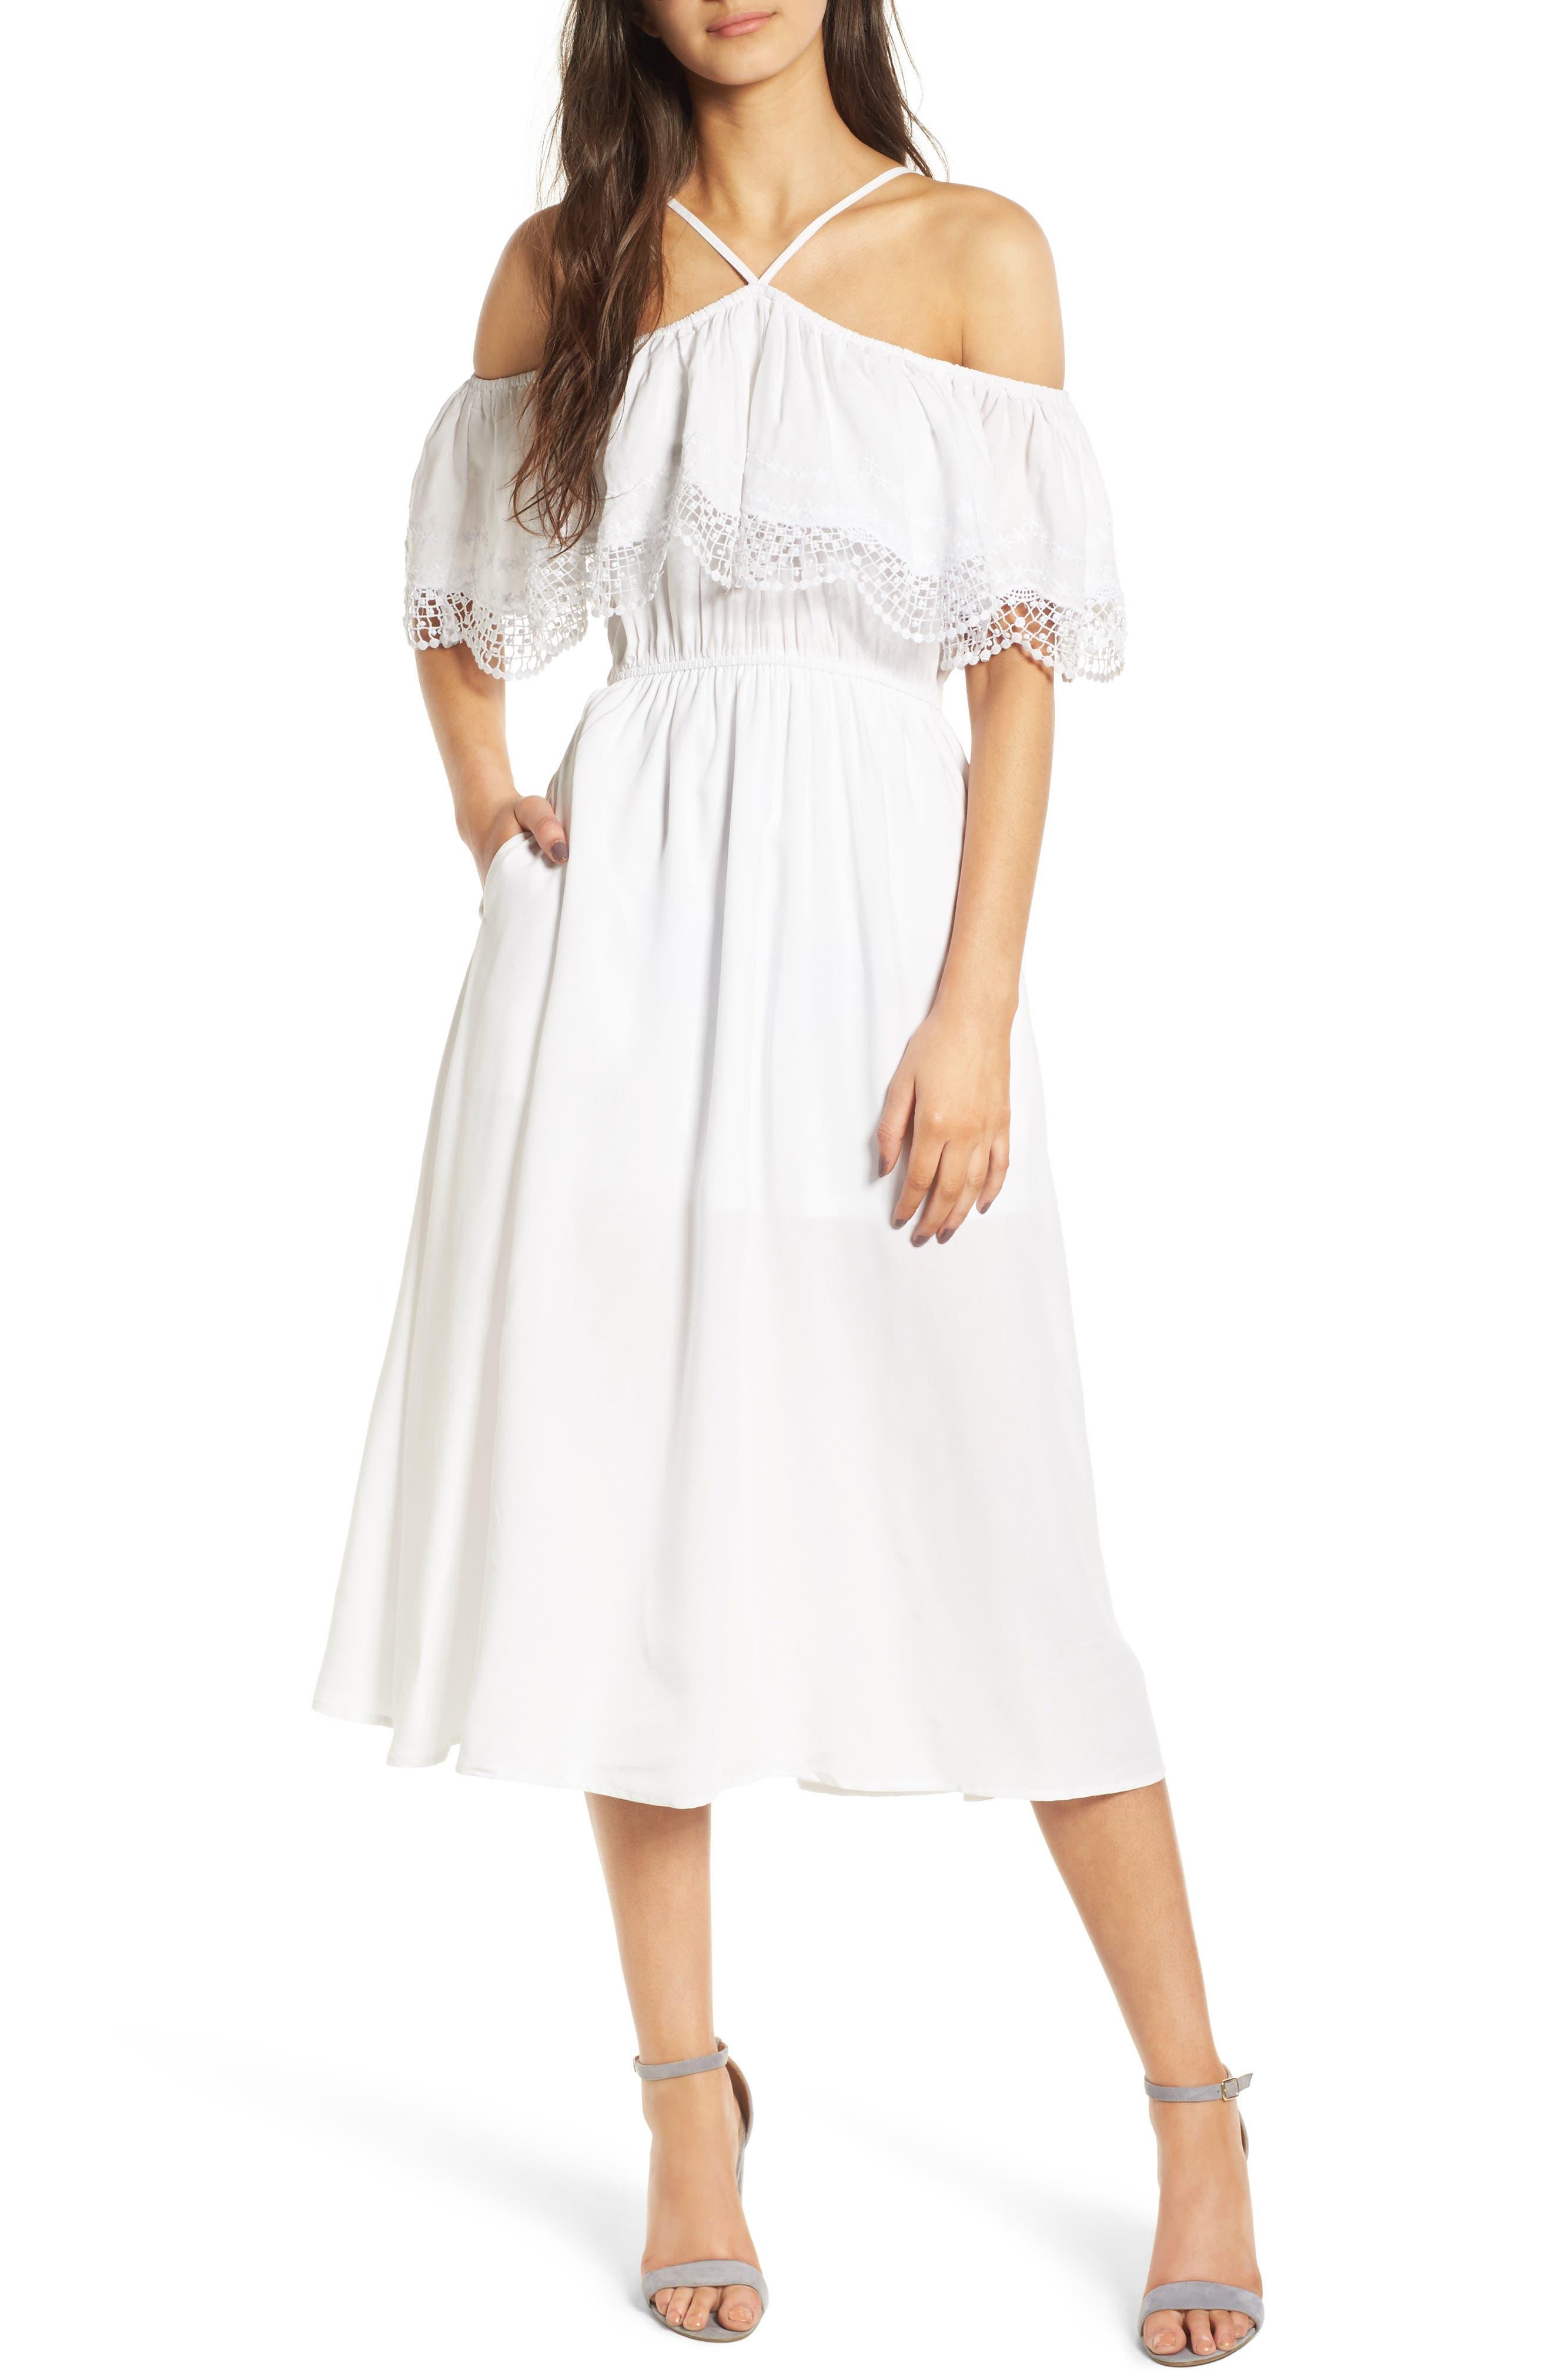 Alternate Image 1 Selected - Love, Fire Lace Trim Cold Shoulder Dress